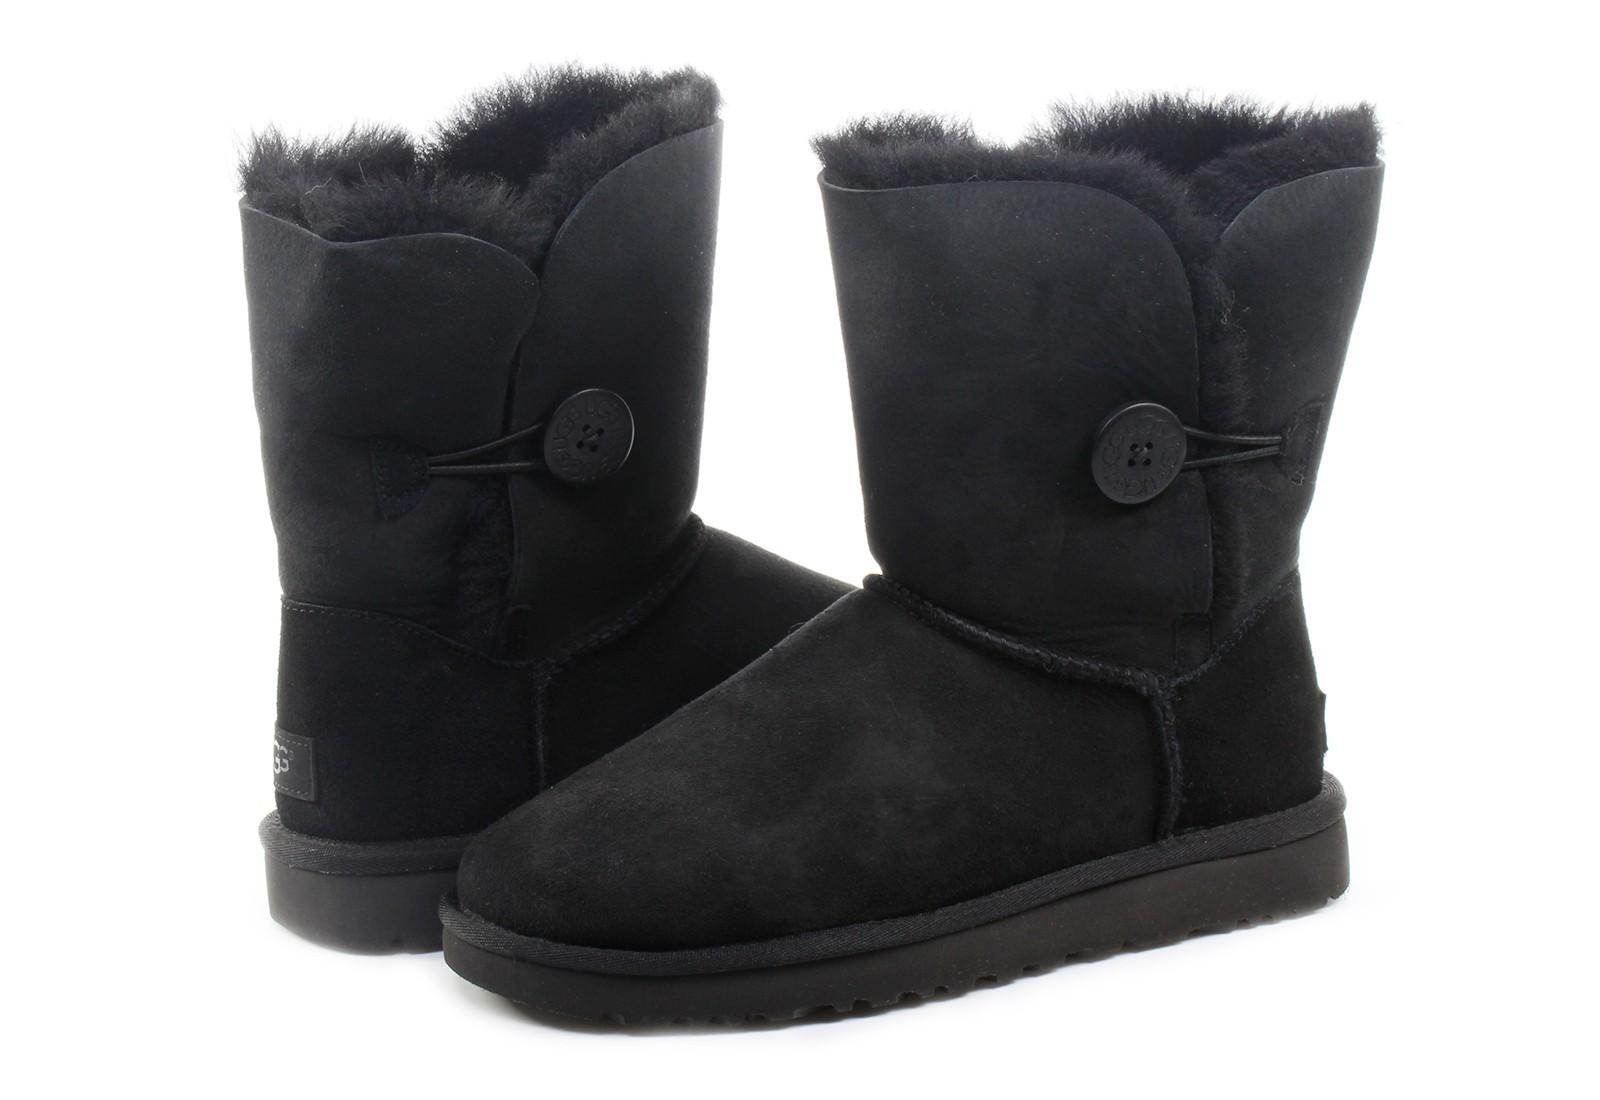 7c413975ff Ugg Csizma - Bailey Button Ii - 1016226-BLK - Office Shoes Magyarország